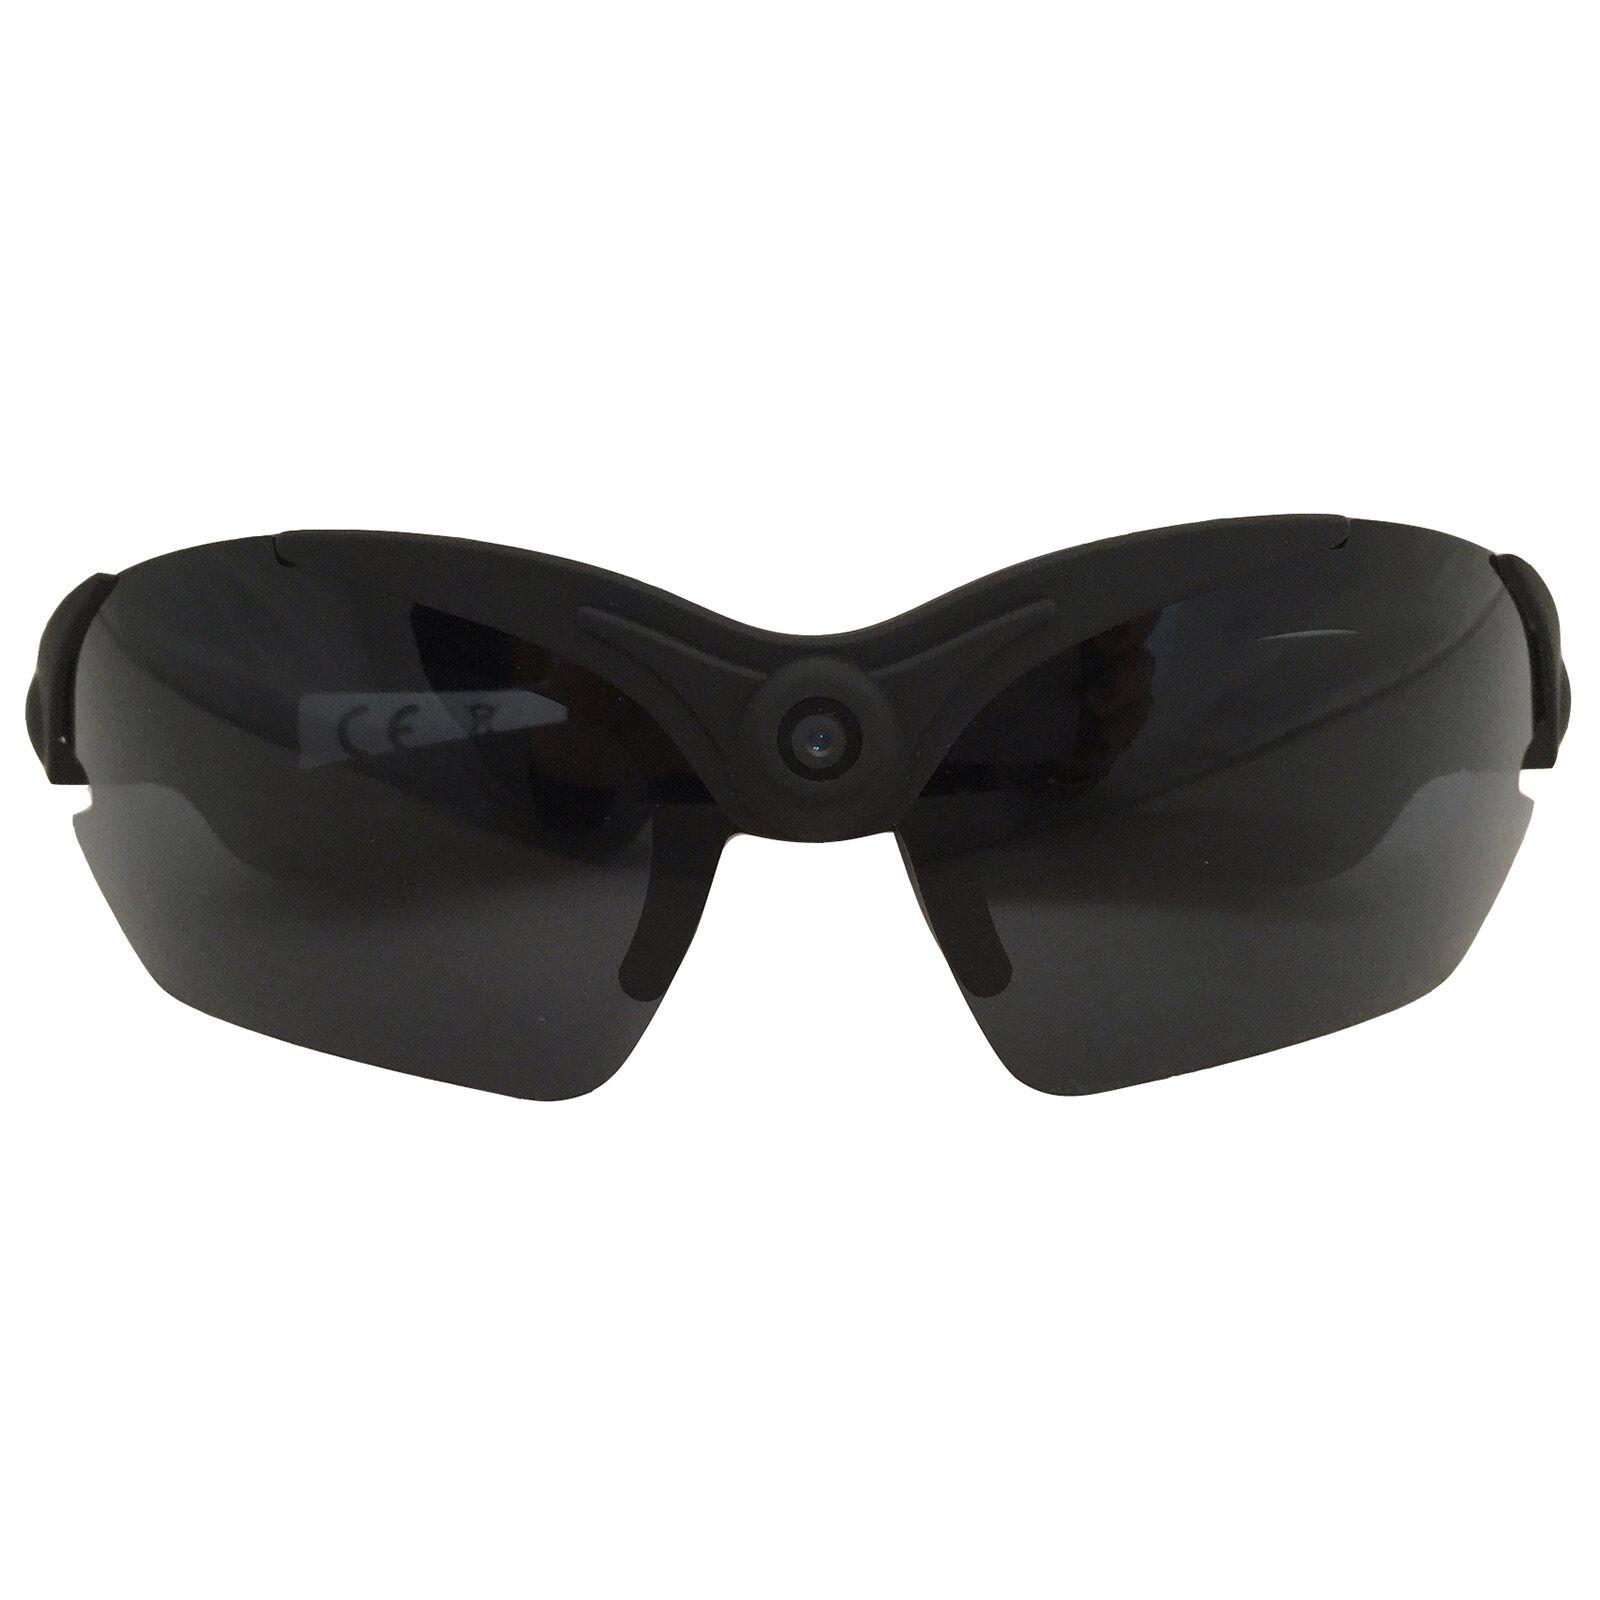 Num'axes kamerabriller med bluetooth.